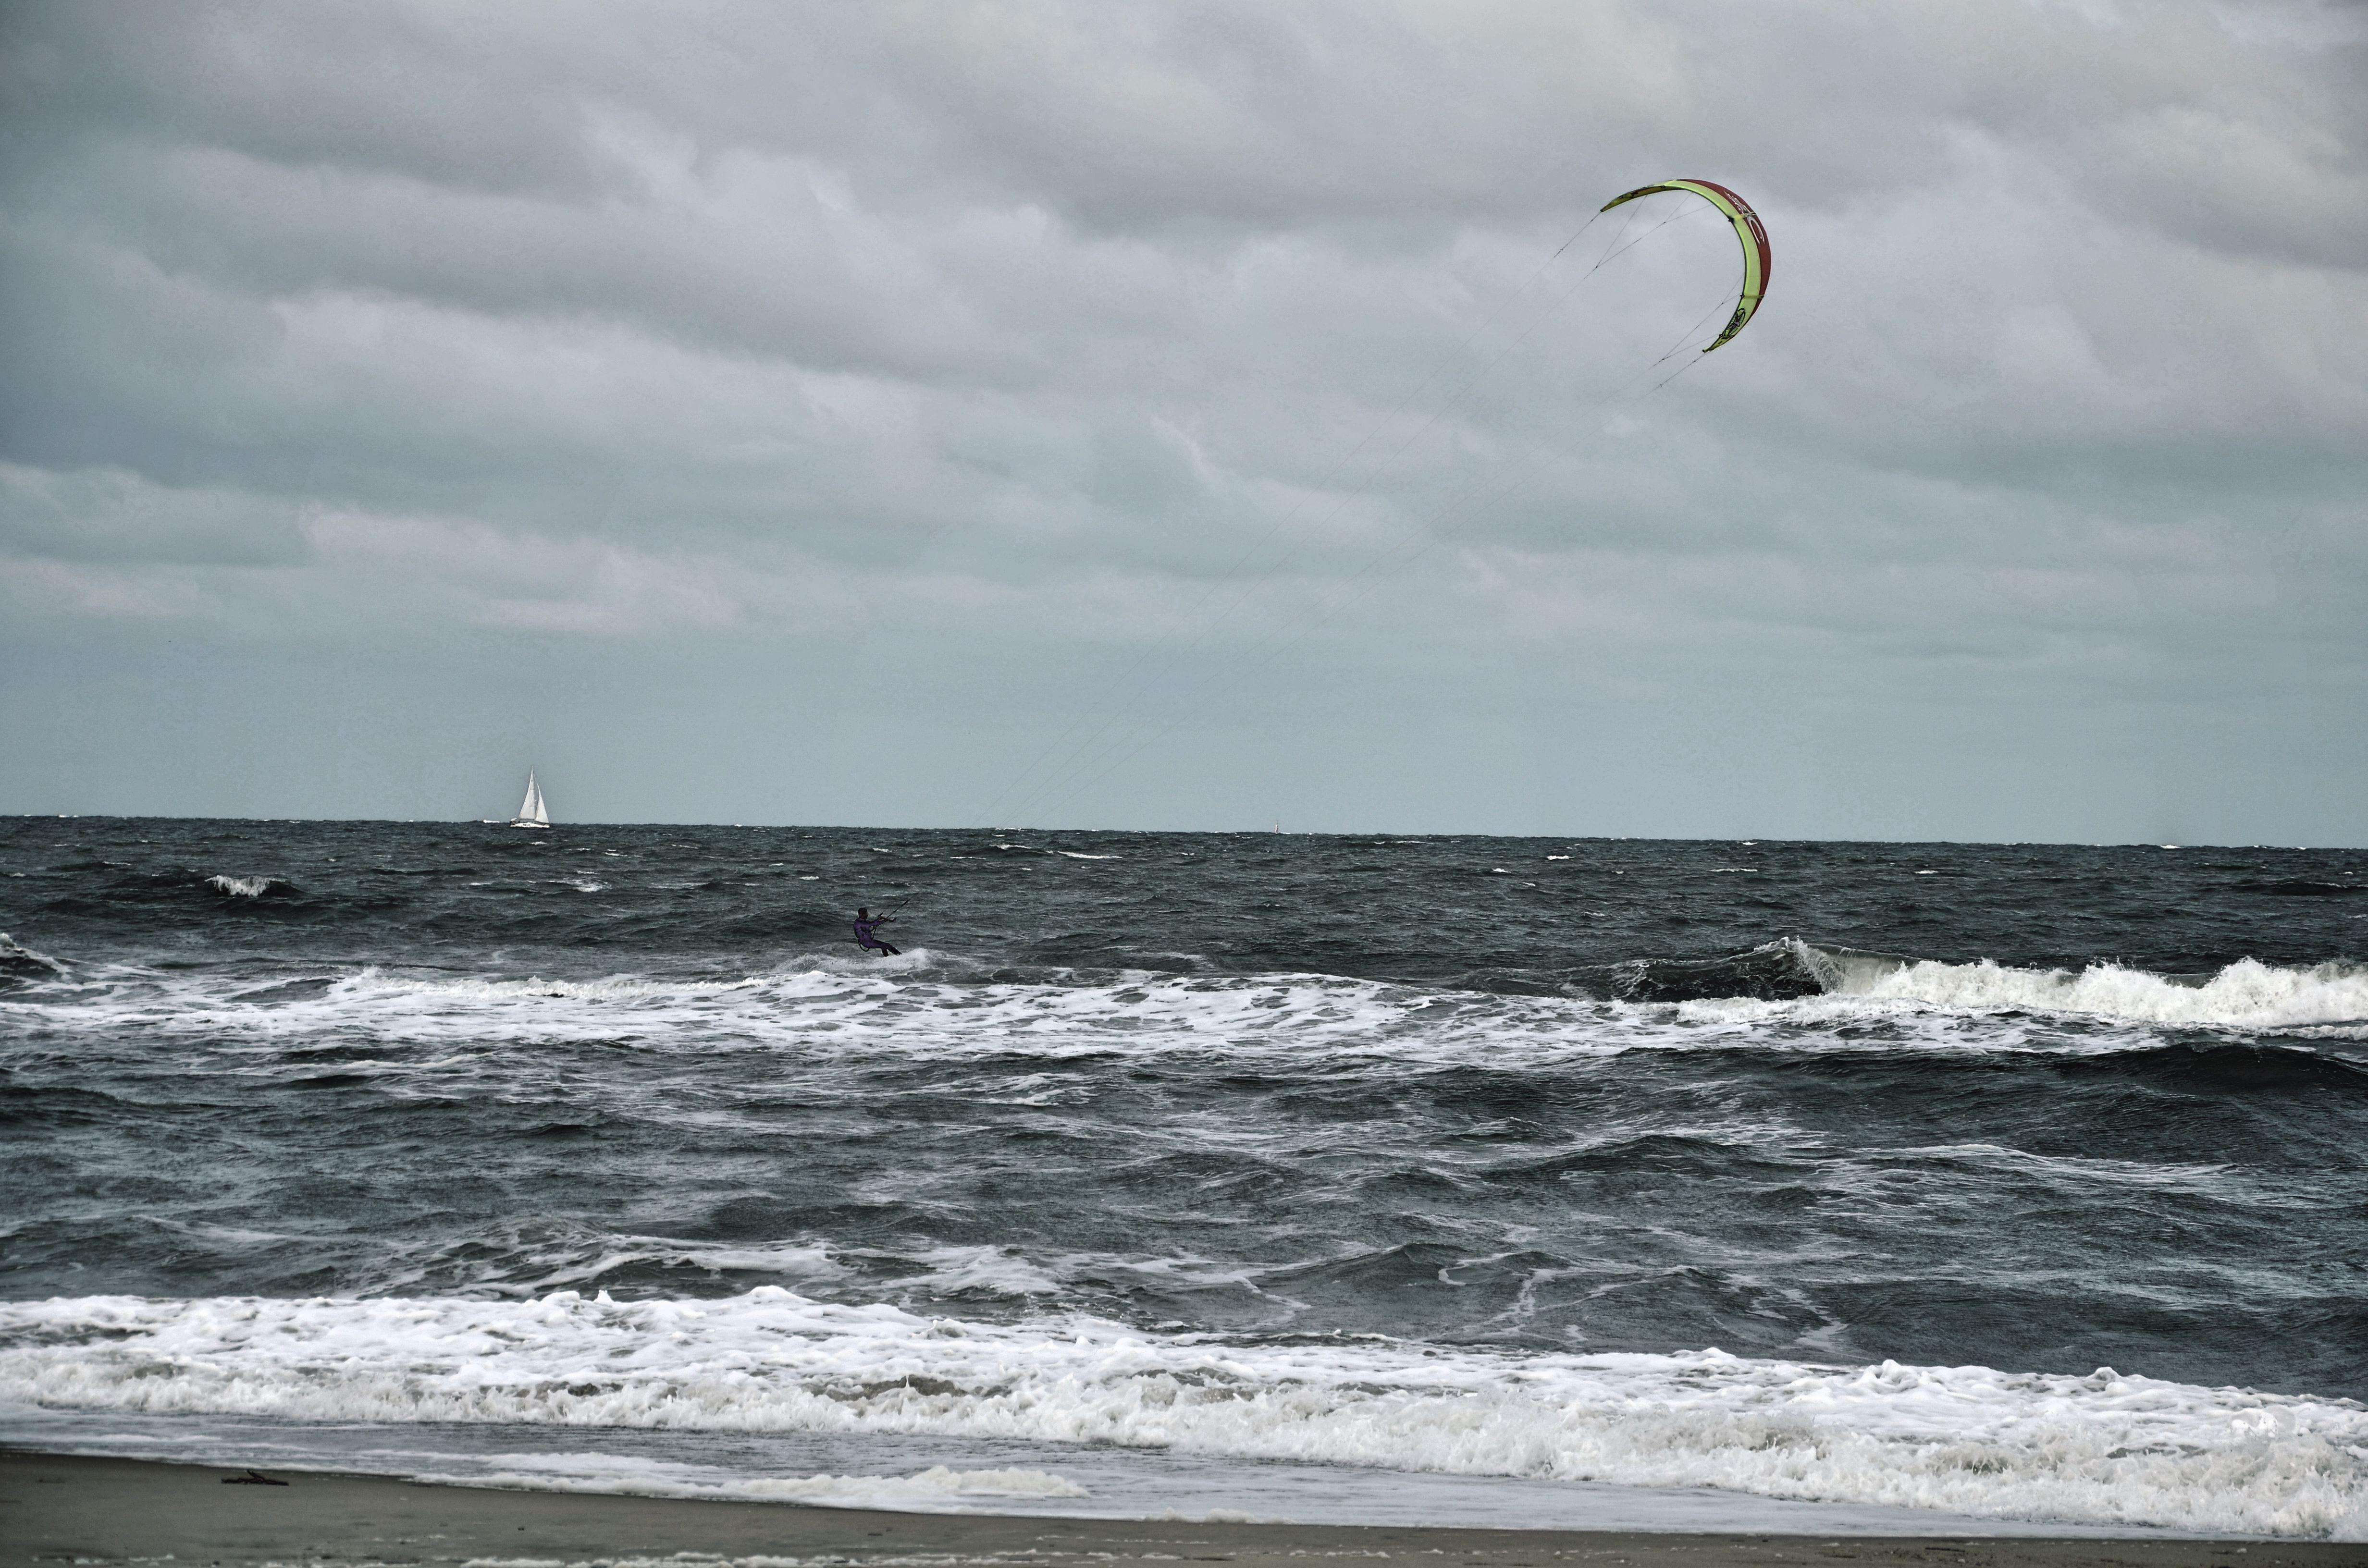 Kite Surfer in Virginia Beach, VA